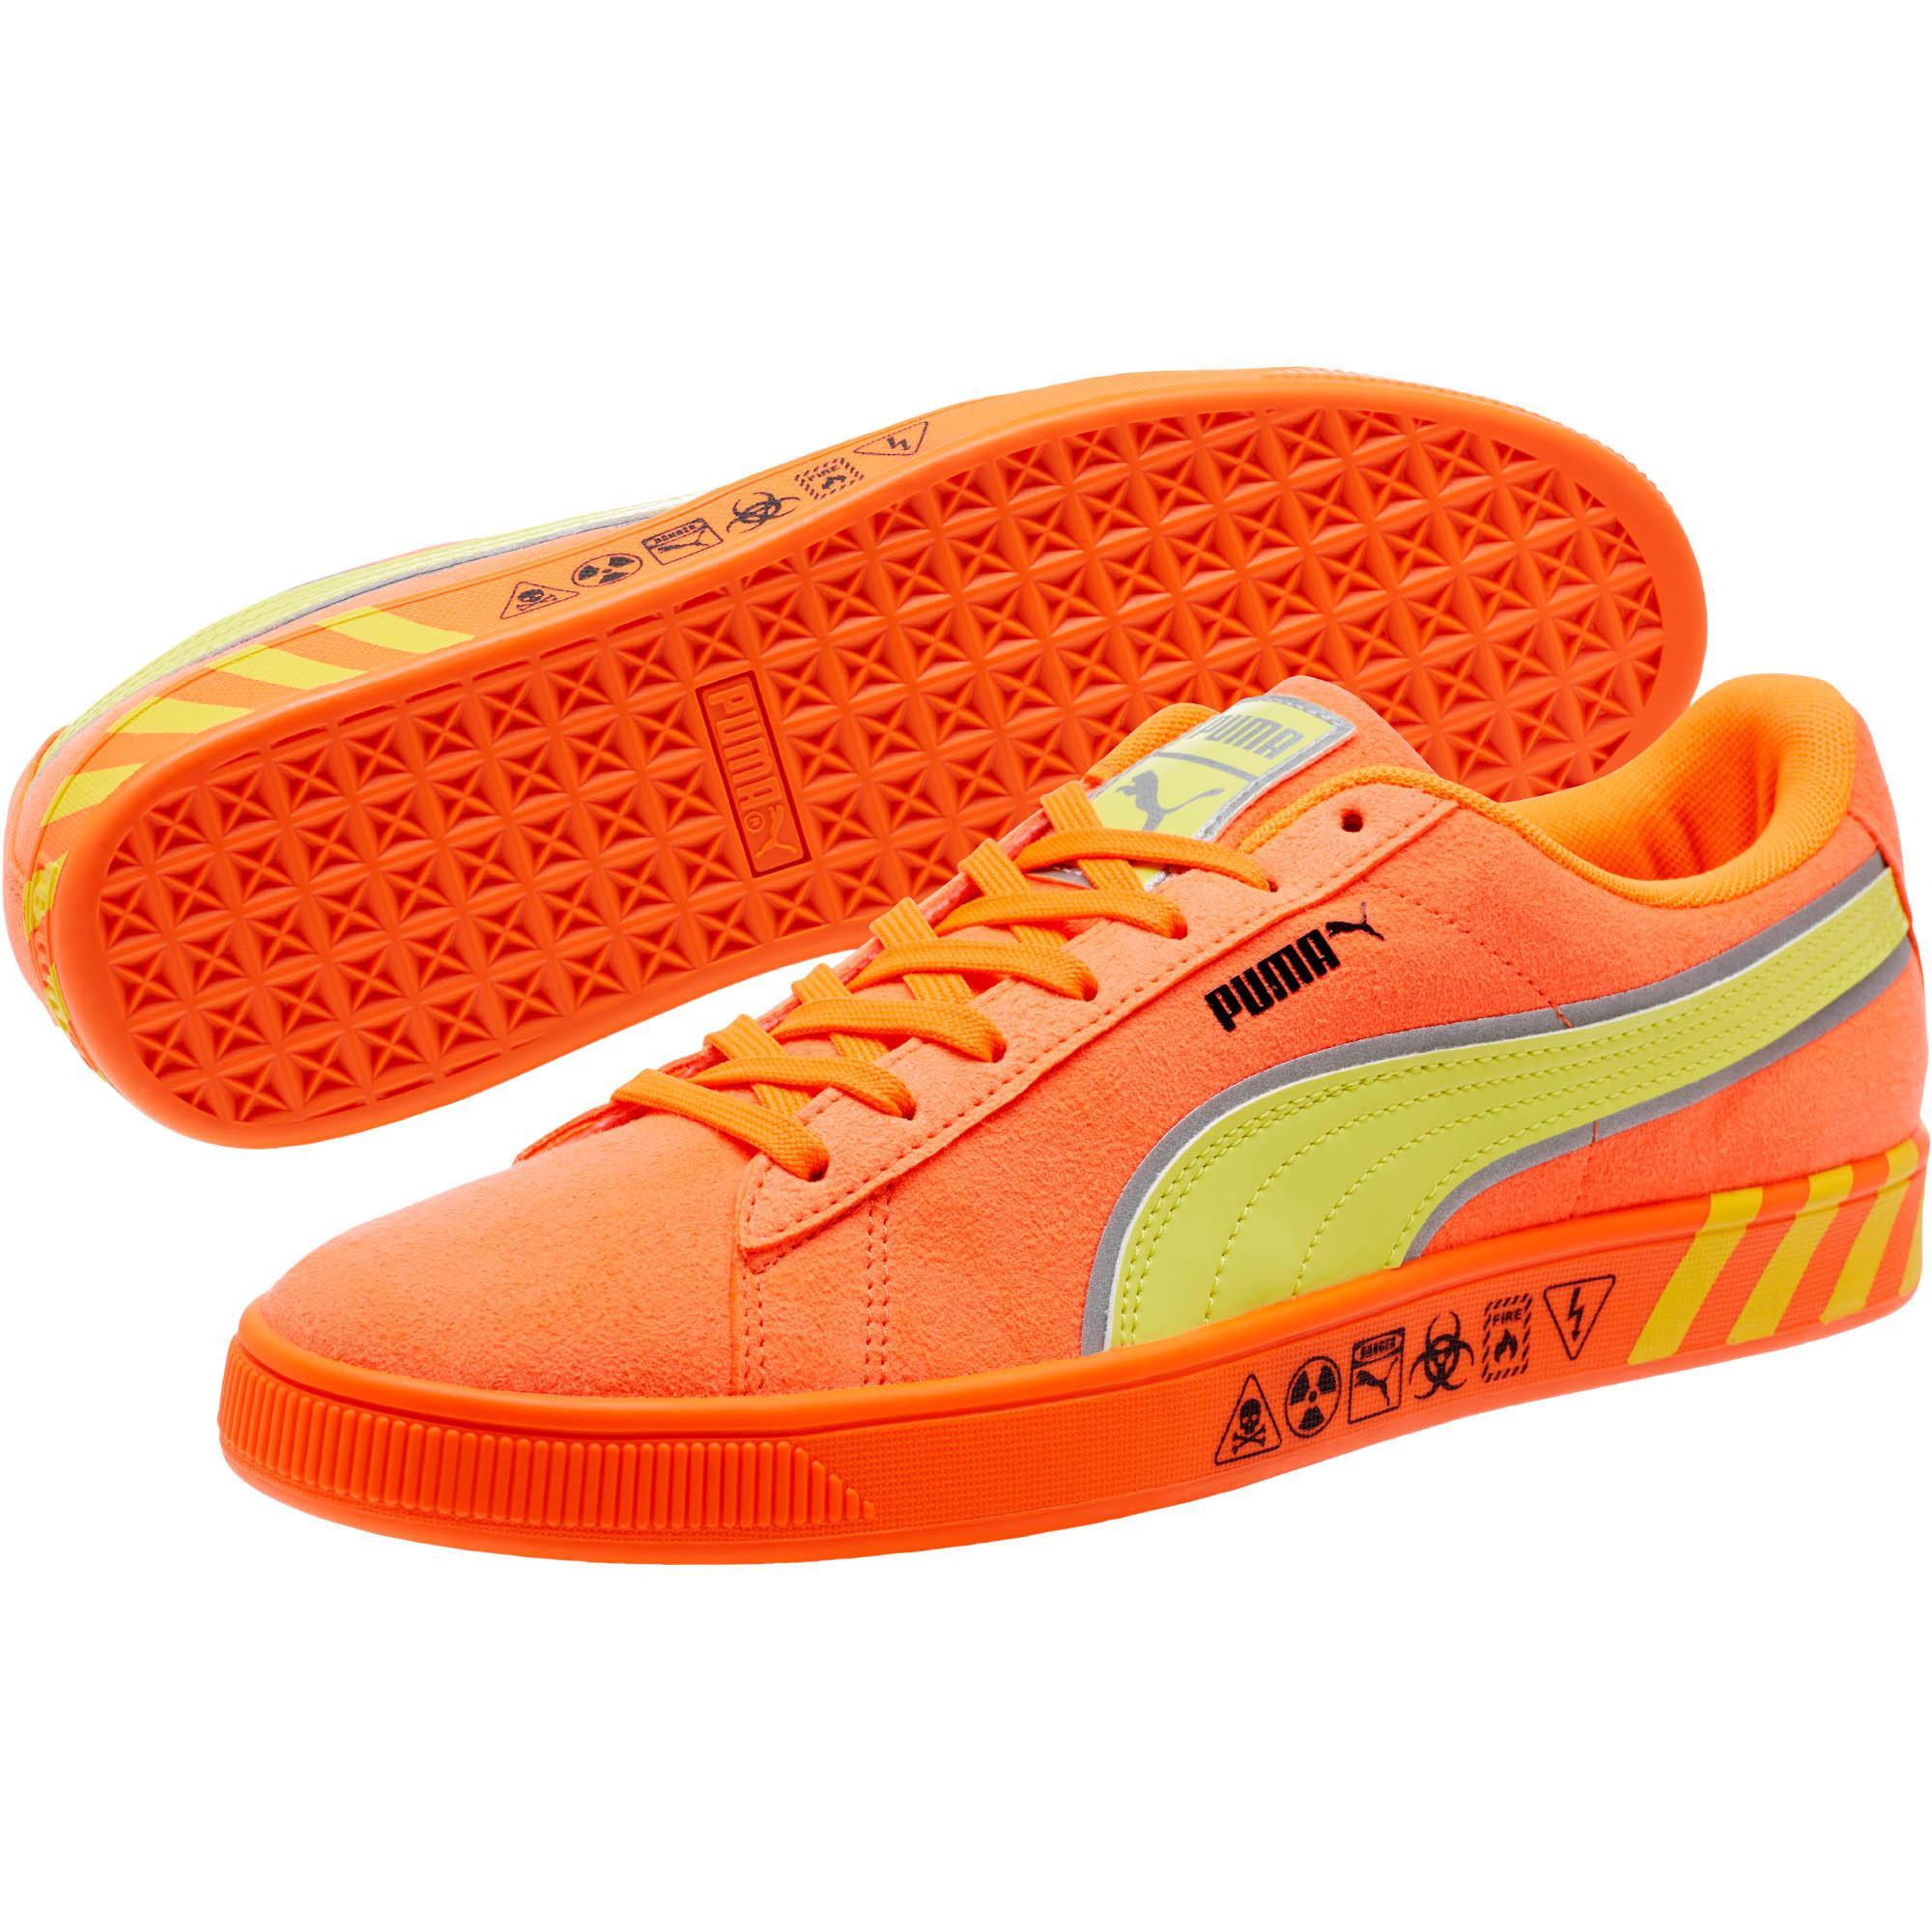 e873be3551f75 Lyst - PUMA Hazard Orange Suede Sneakers in Orange for Men